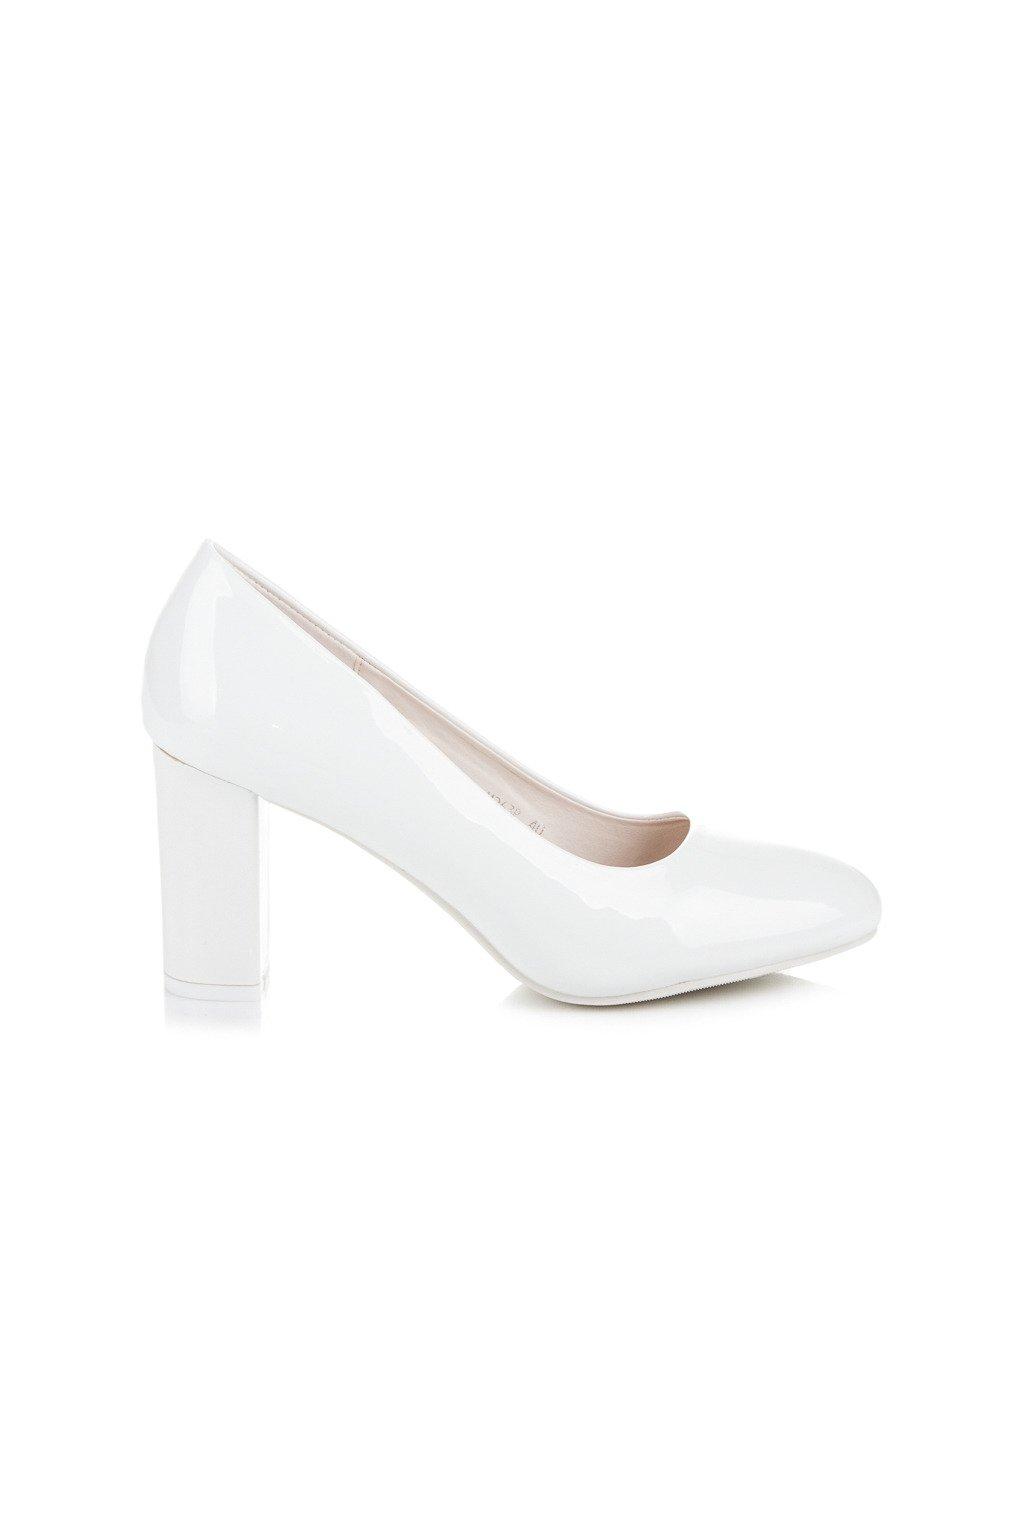 Elegantné biele lodičky Seastar 6779a375b1f